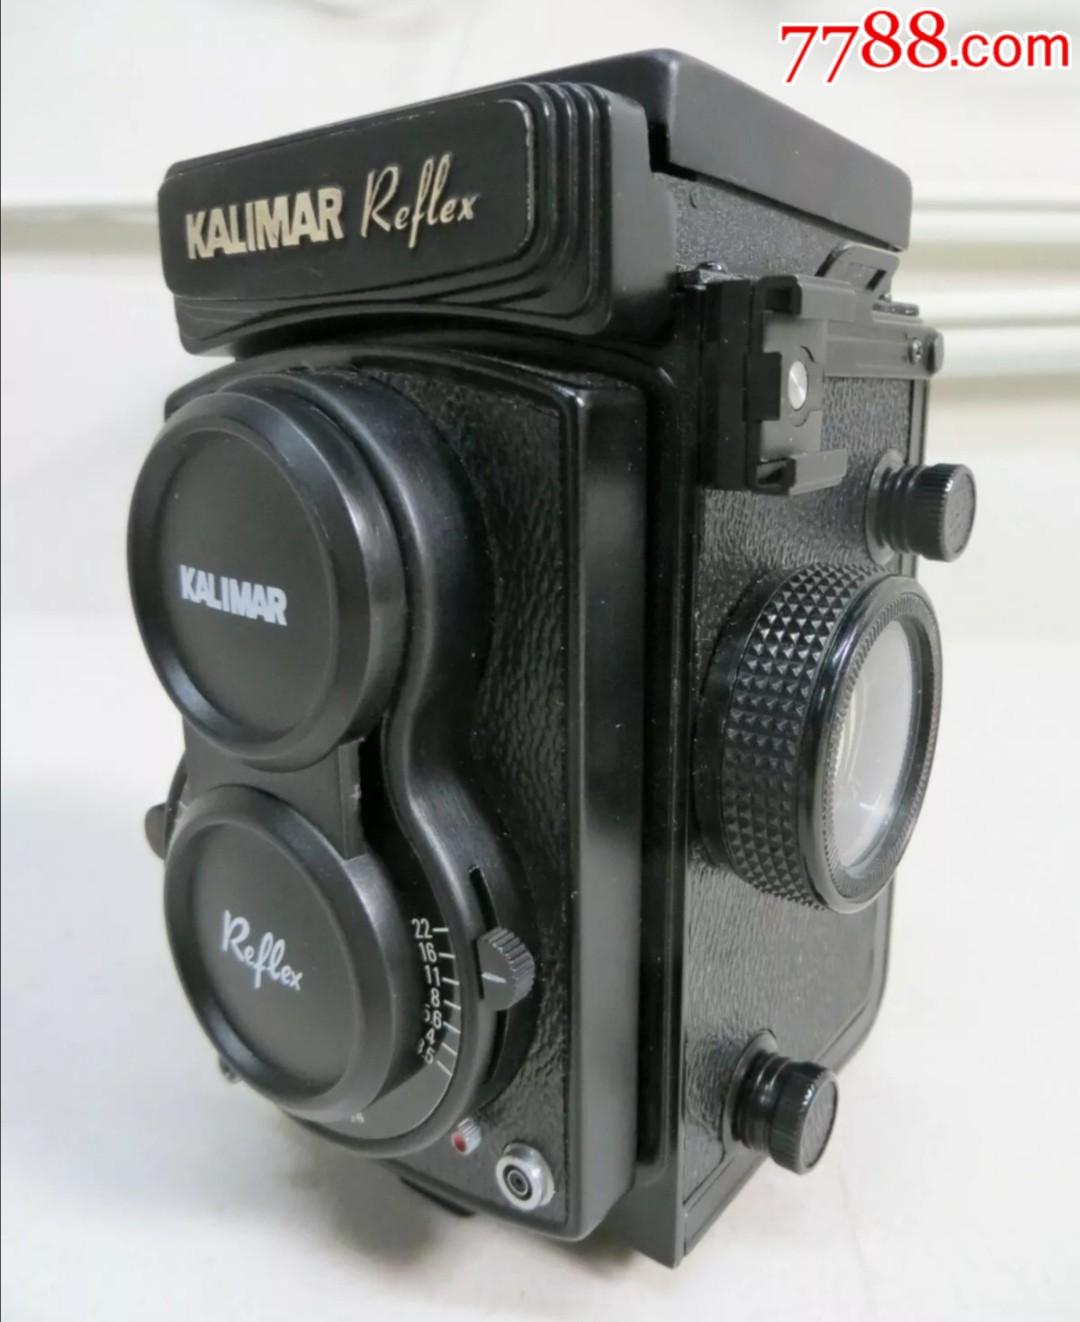 Kalimarreflex稀少海�t定制(au21395778)_